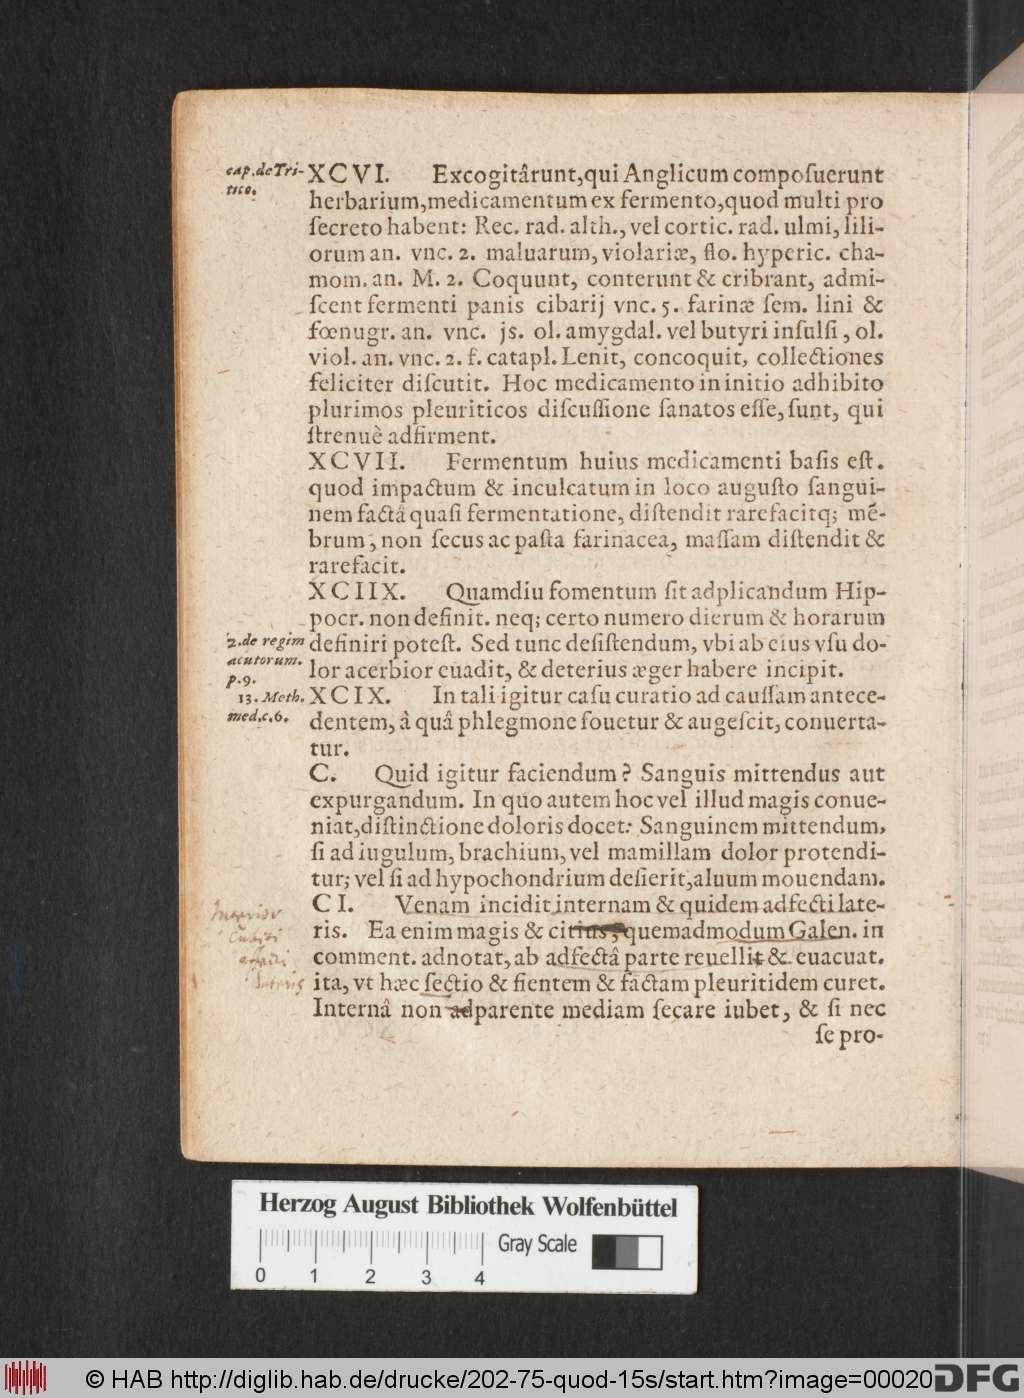 http://diglib.hab.de/drucke/202-75-quod-15s/00020.jpg